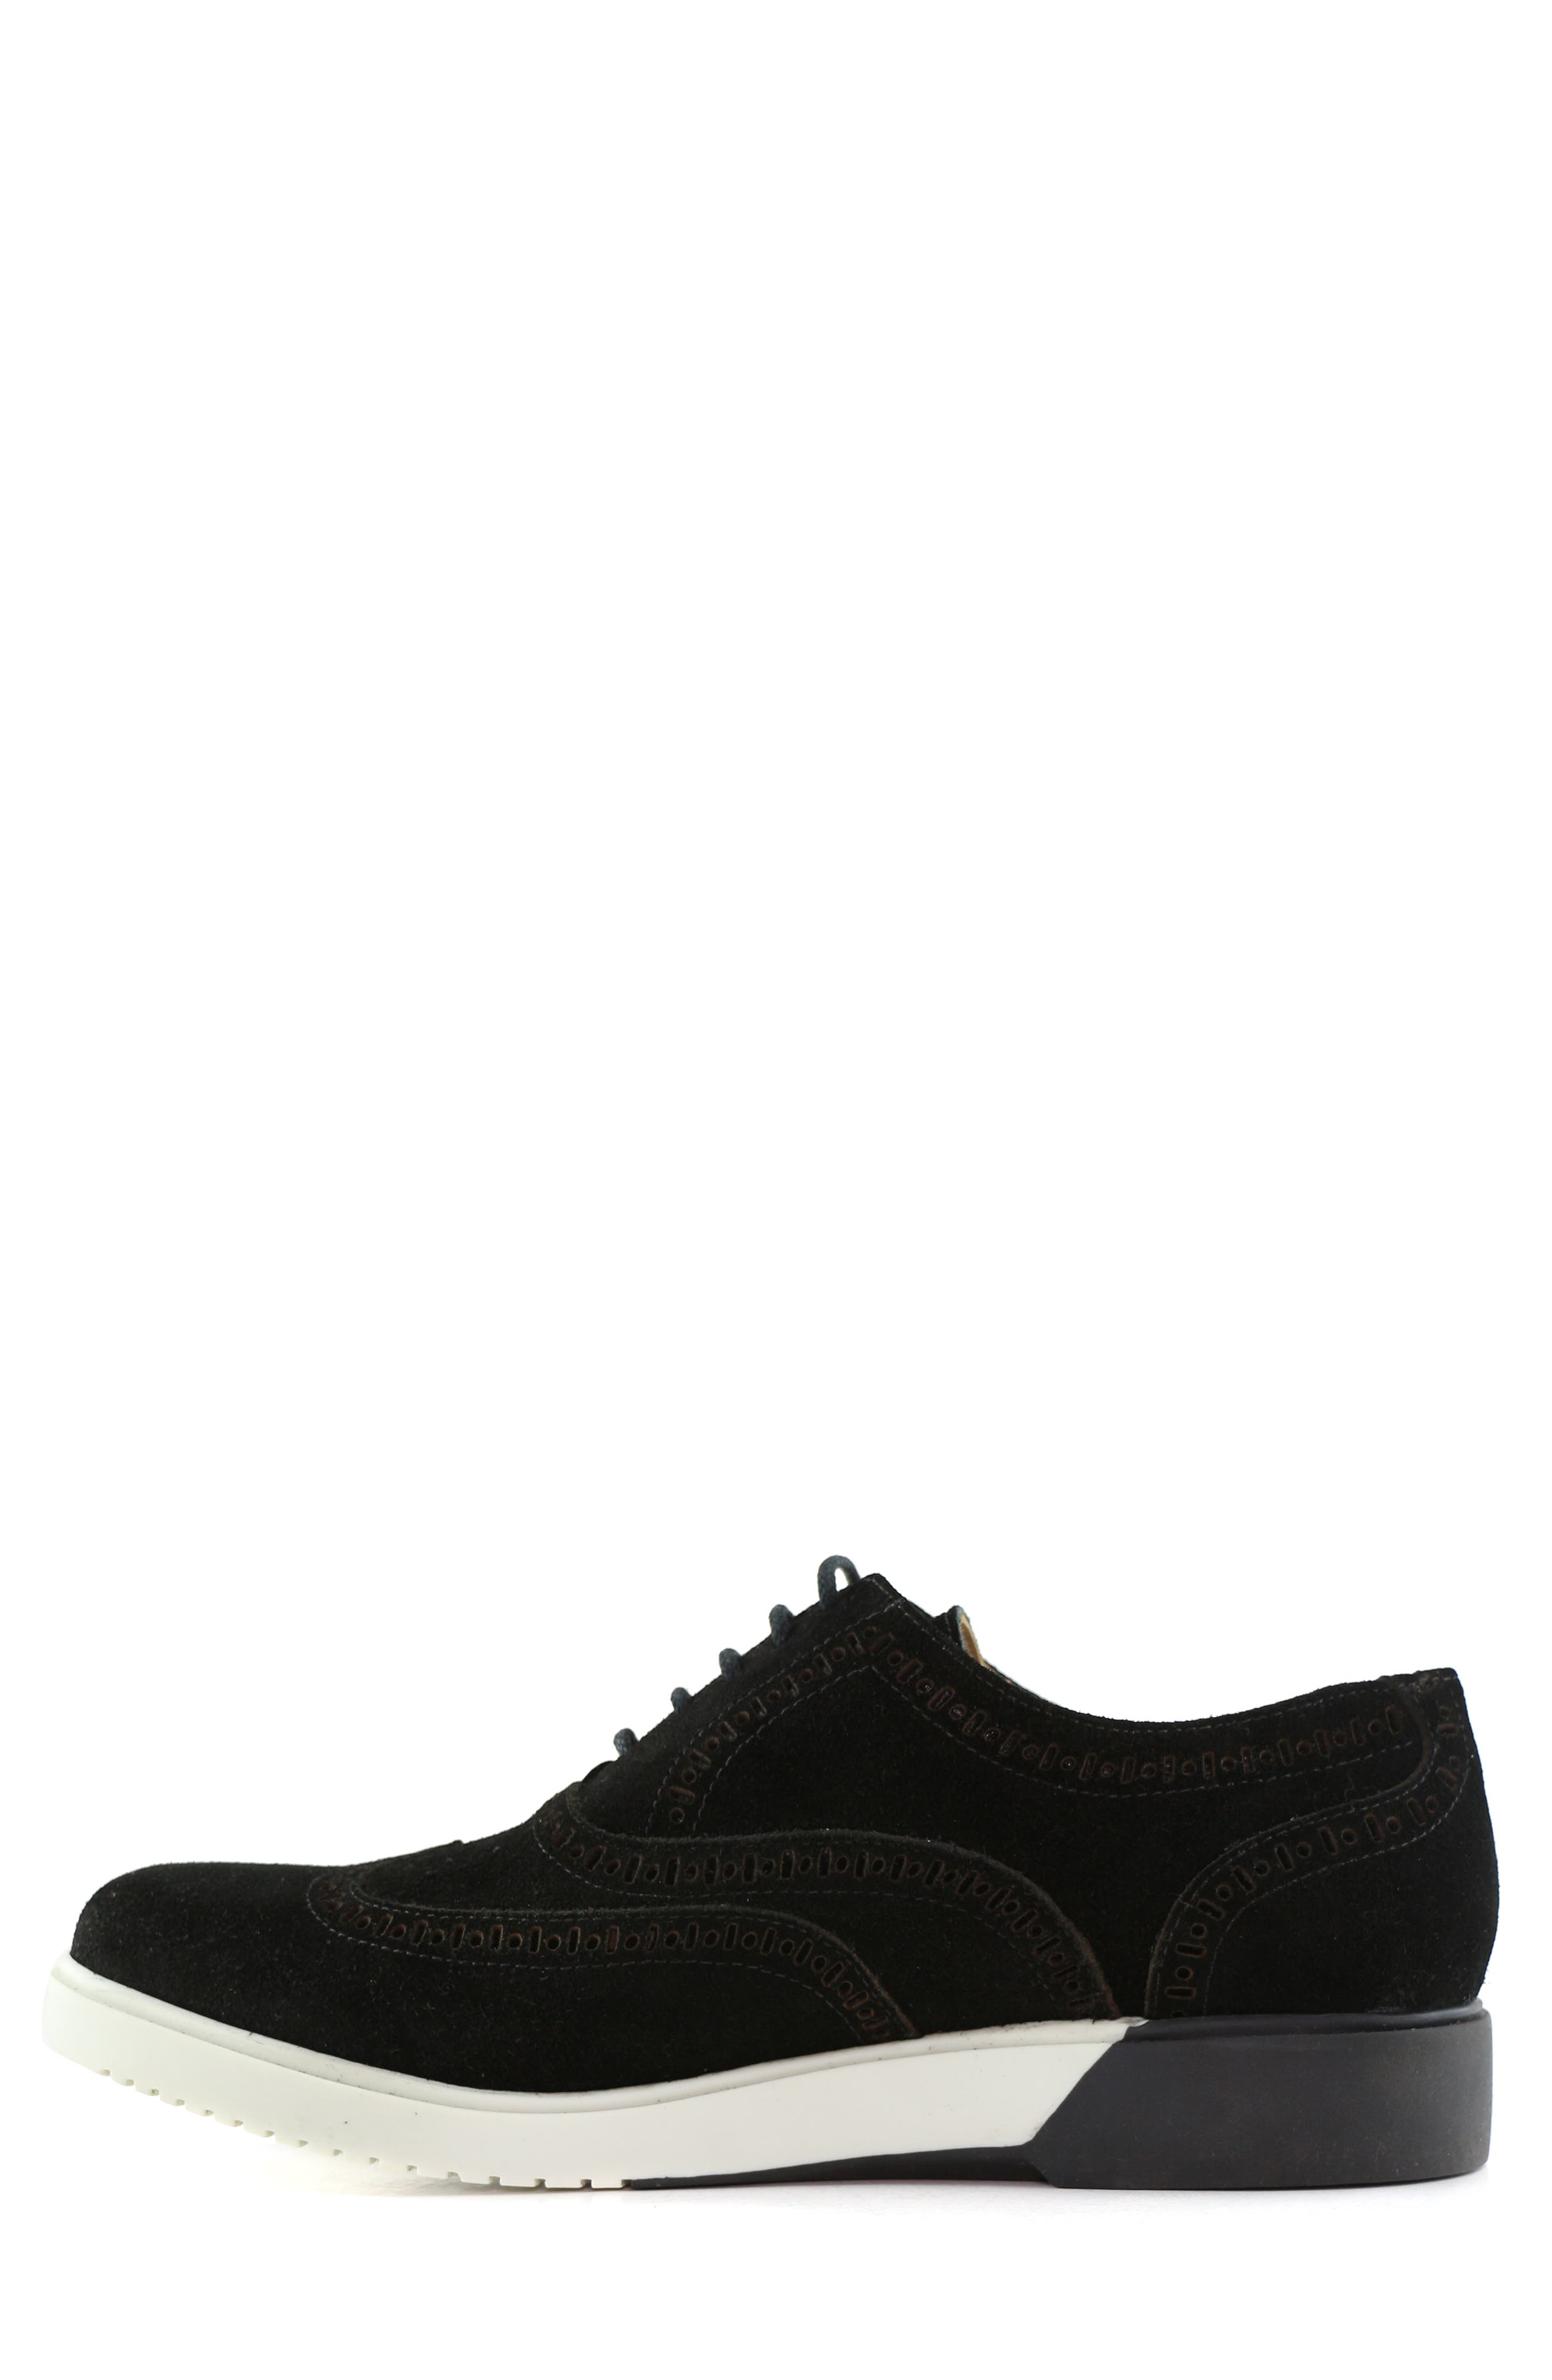 5th Ave Wingtip Sneaker,                             Alternate thumbnail 33, color,